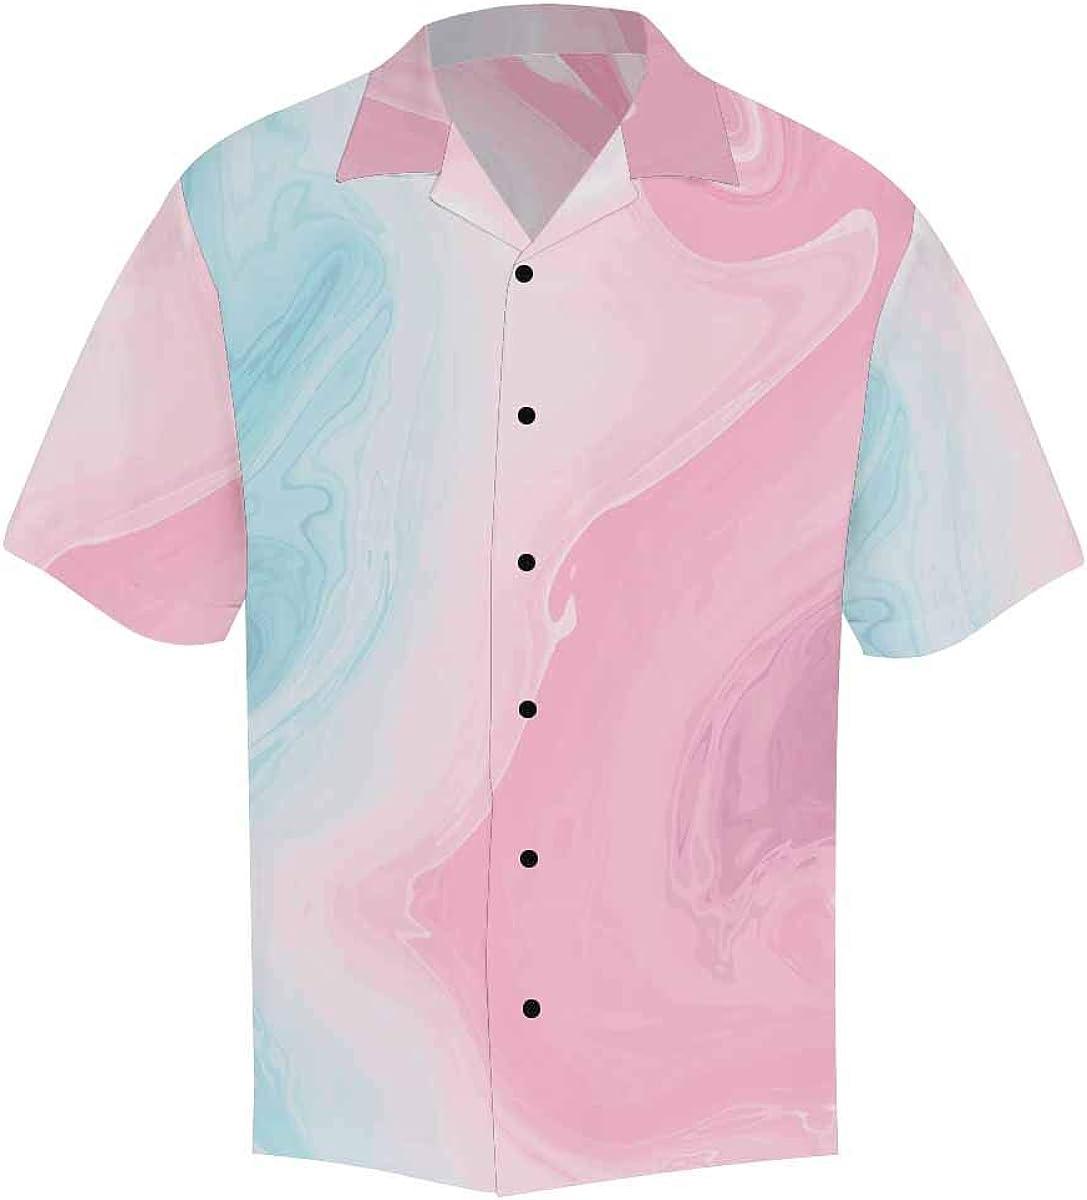 InterestPrint Men's Casual Button Down Short Sleeve African Tribal Boho Ethnic Hawaiian Shirt (S-5XL)